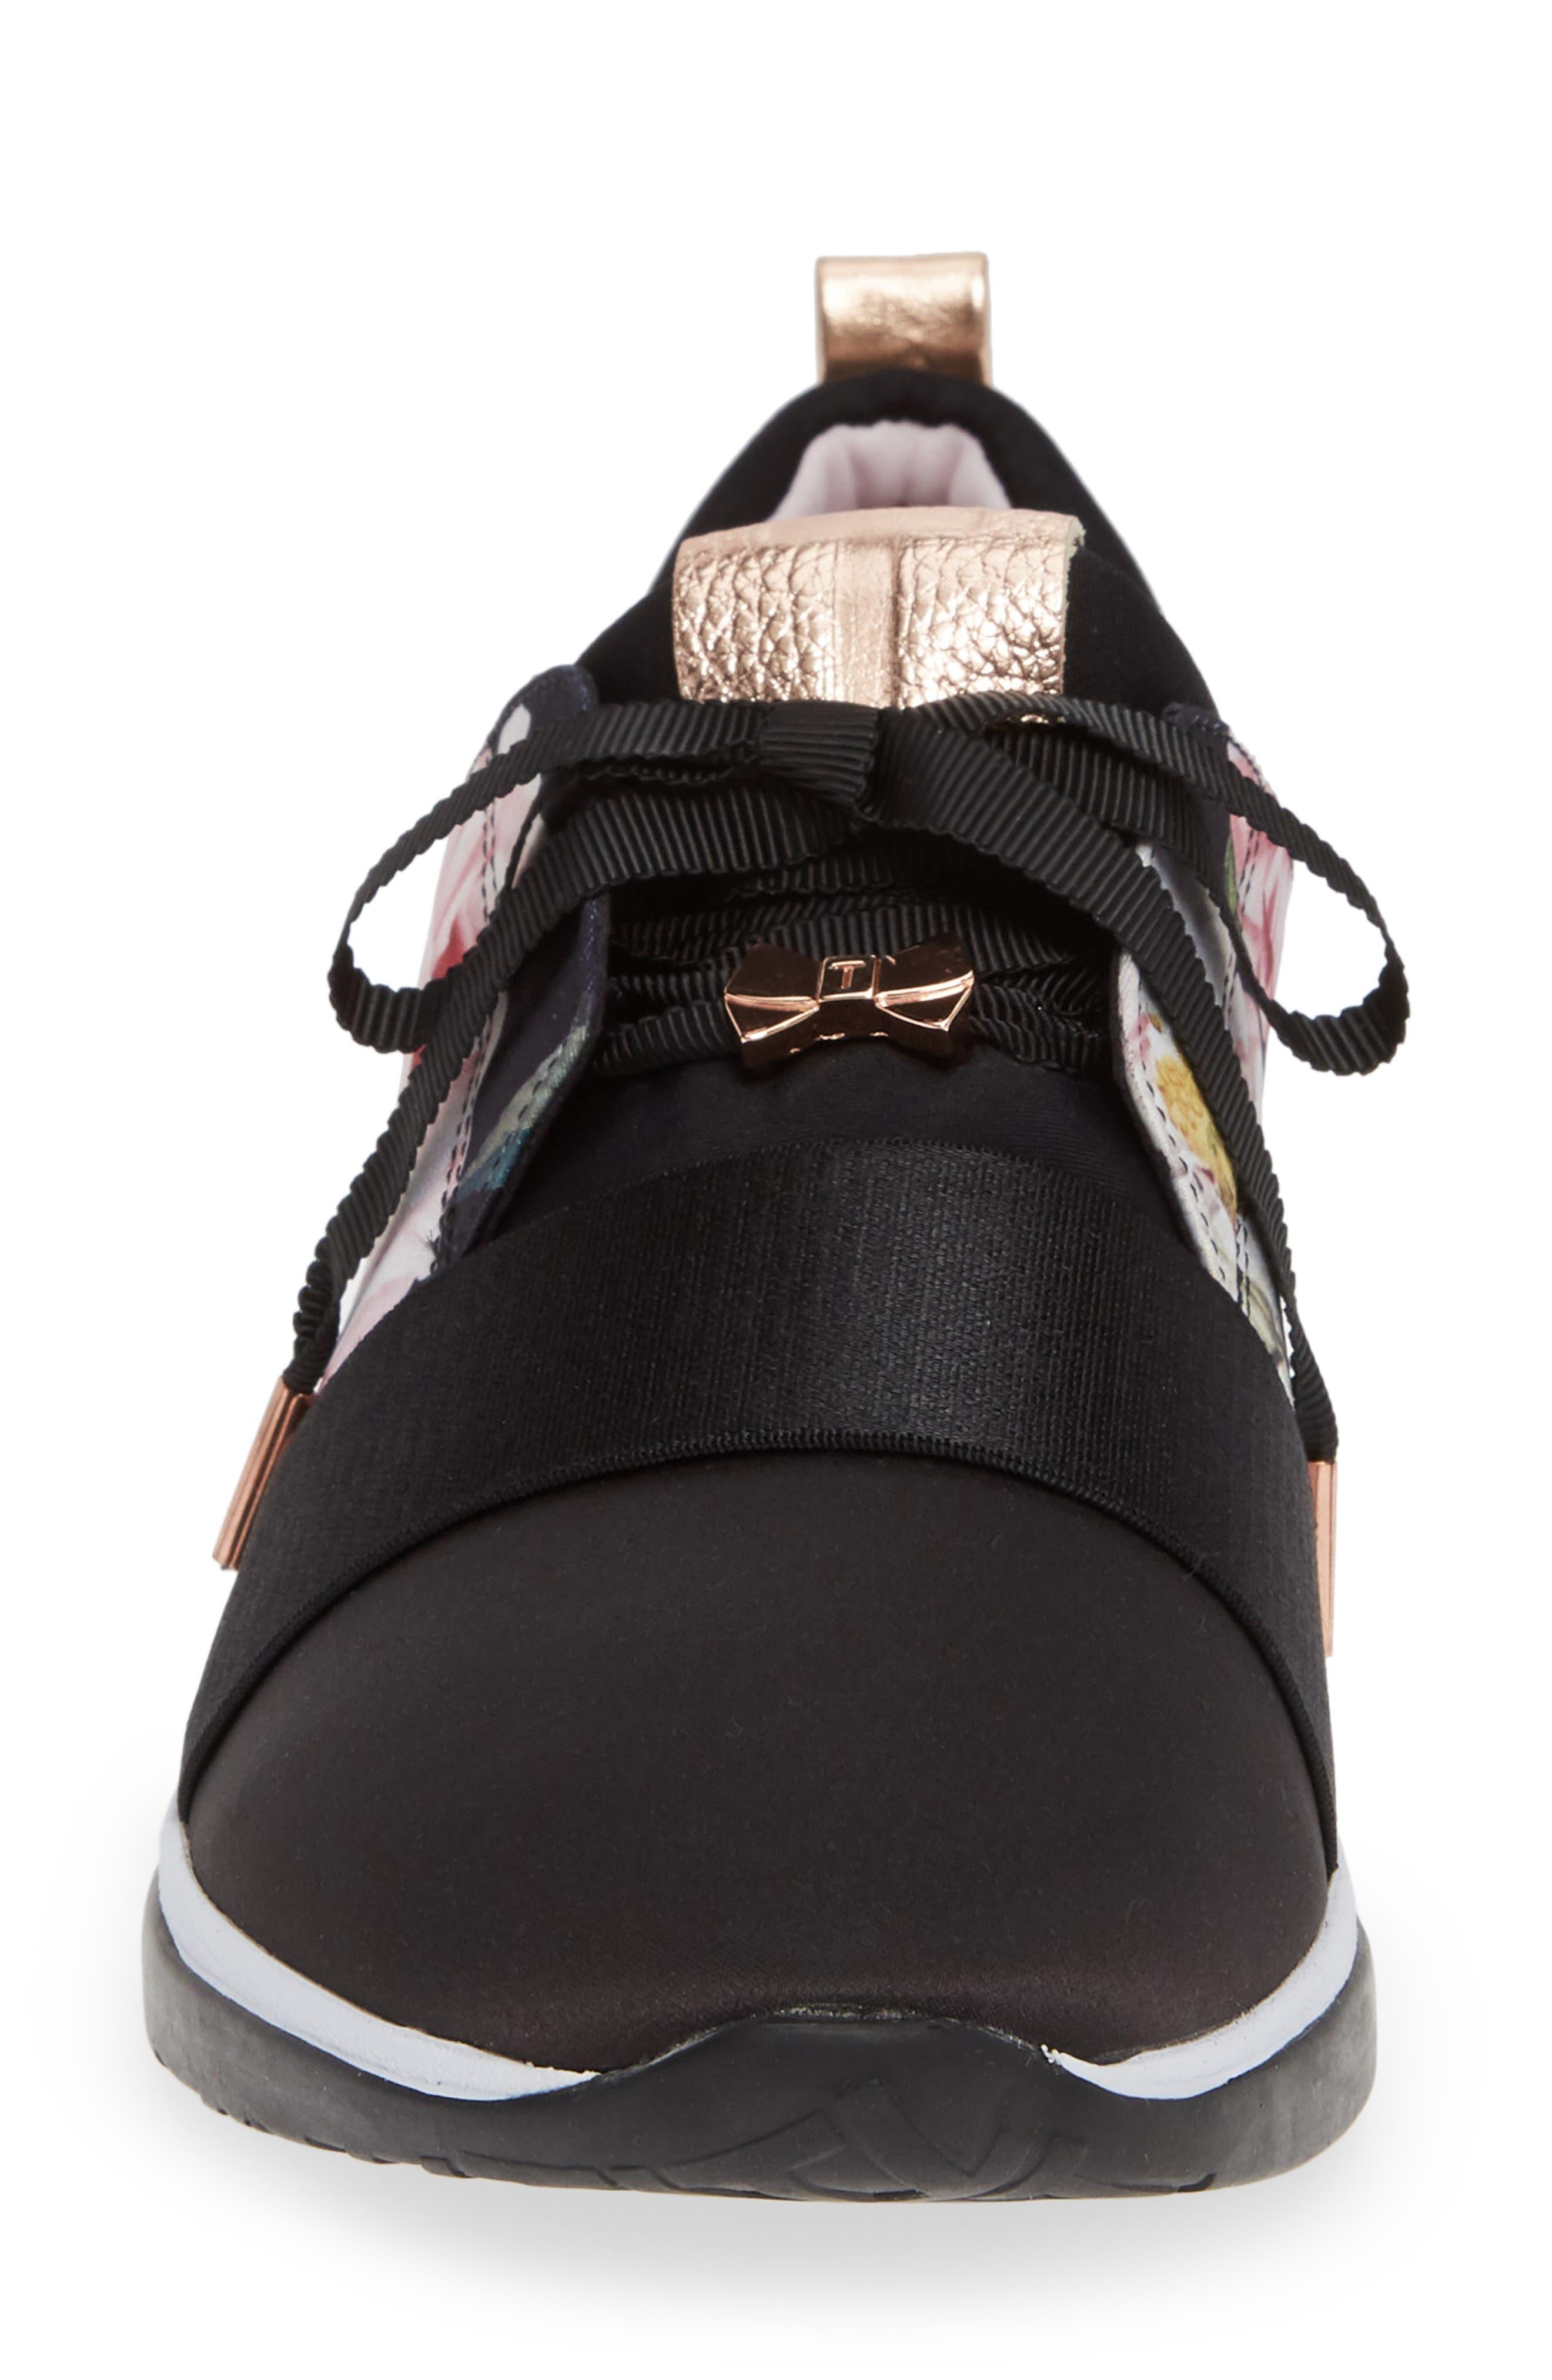 Cepap 2 Sneaker,                             Alternate thumbnail 4, color,                             001